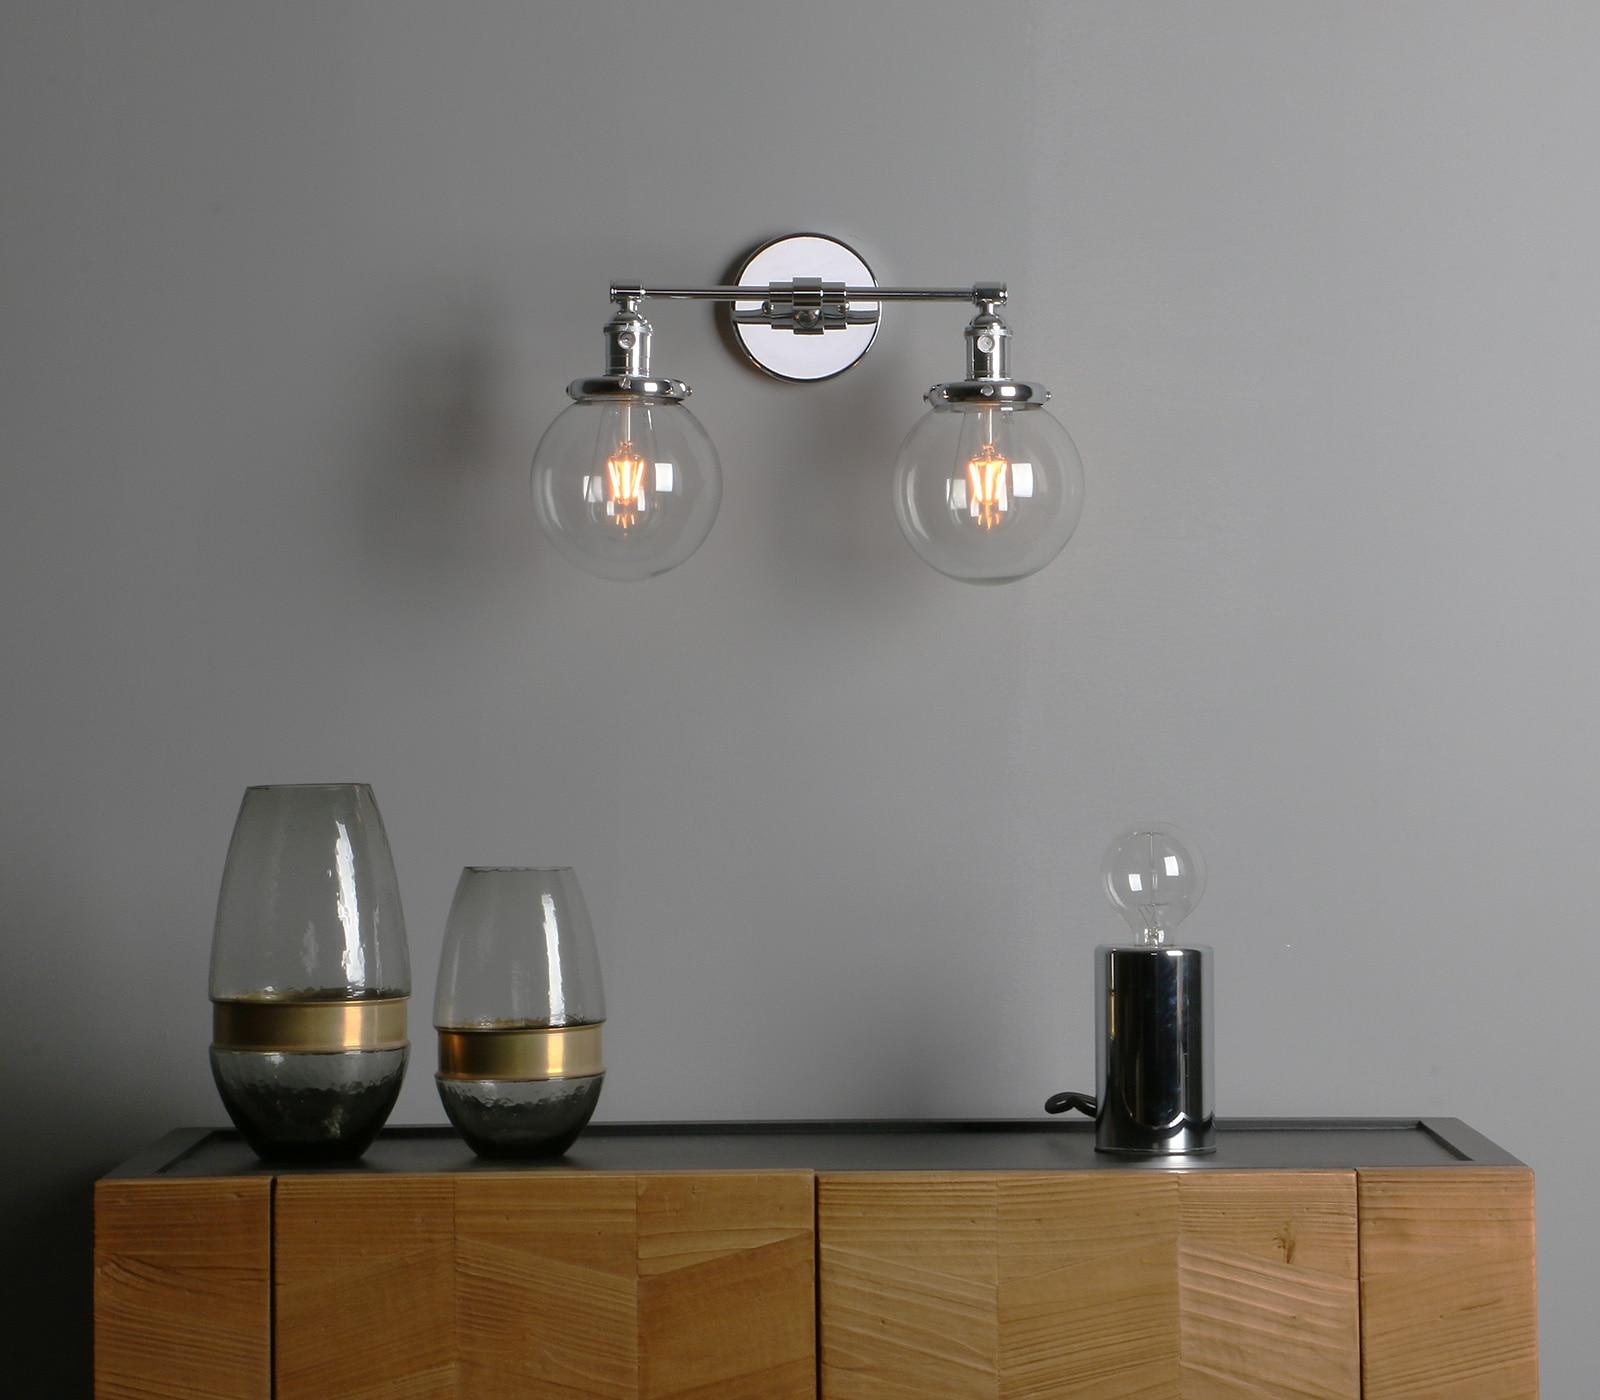 Permo Vintage 5.9'' Glass Ball Shade Loft Globe Glass Double Heads Wall Light Retro Wall Lamp E27 Sconce Fixtures for Home Decor